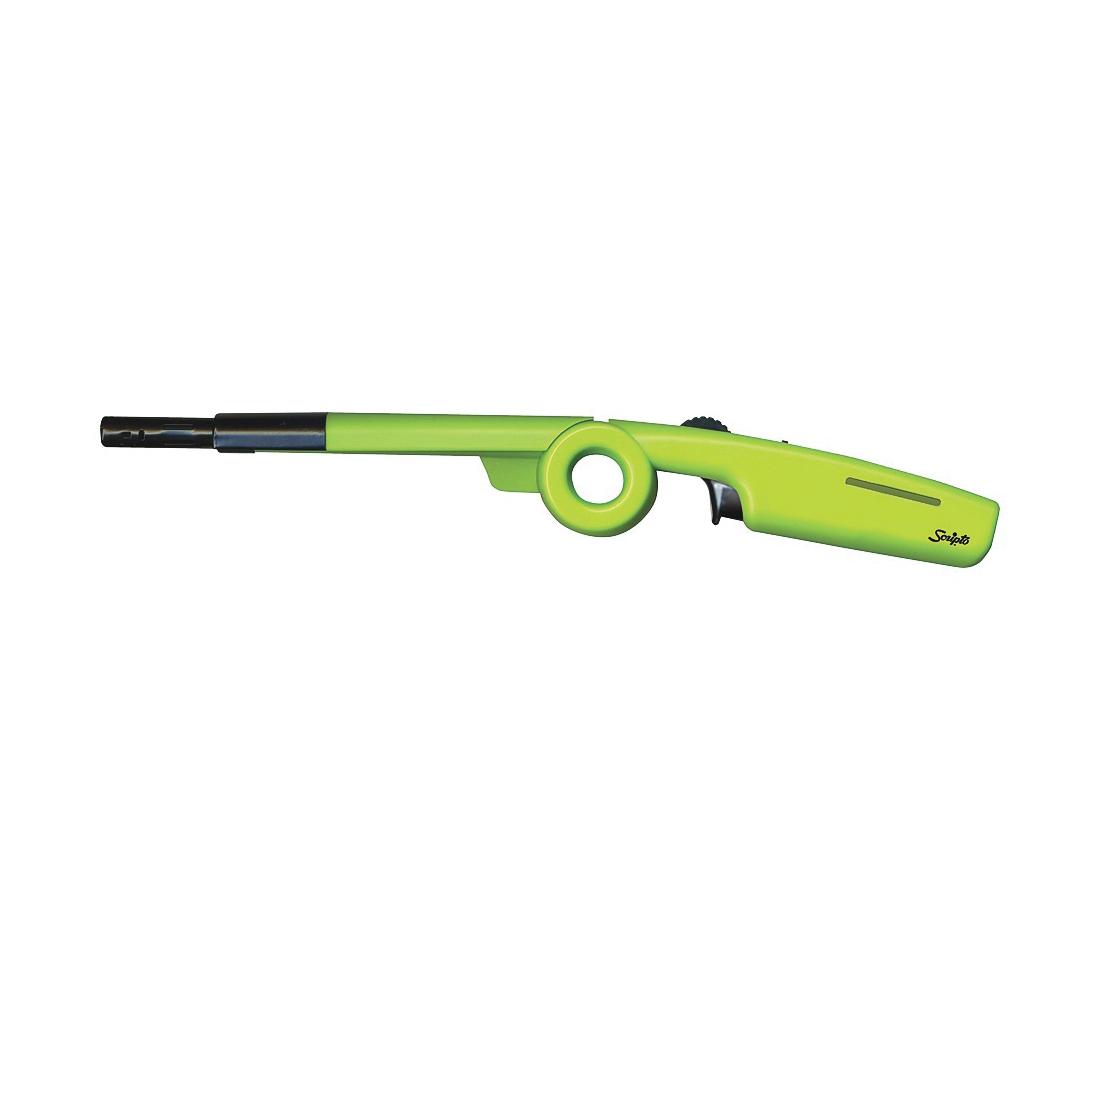 Picture of Scripto BGM7R-1/12CD Folding Utility Lighter, Butane, Neon Green